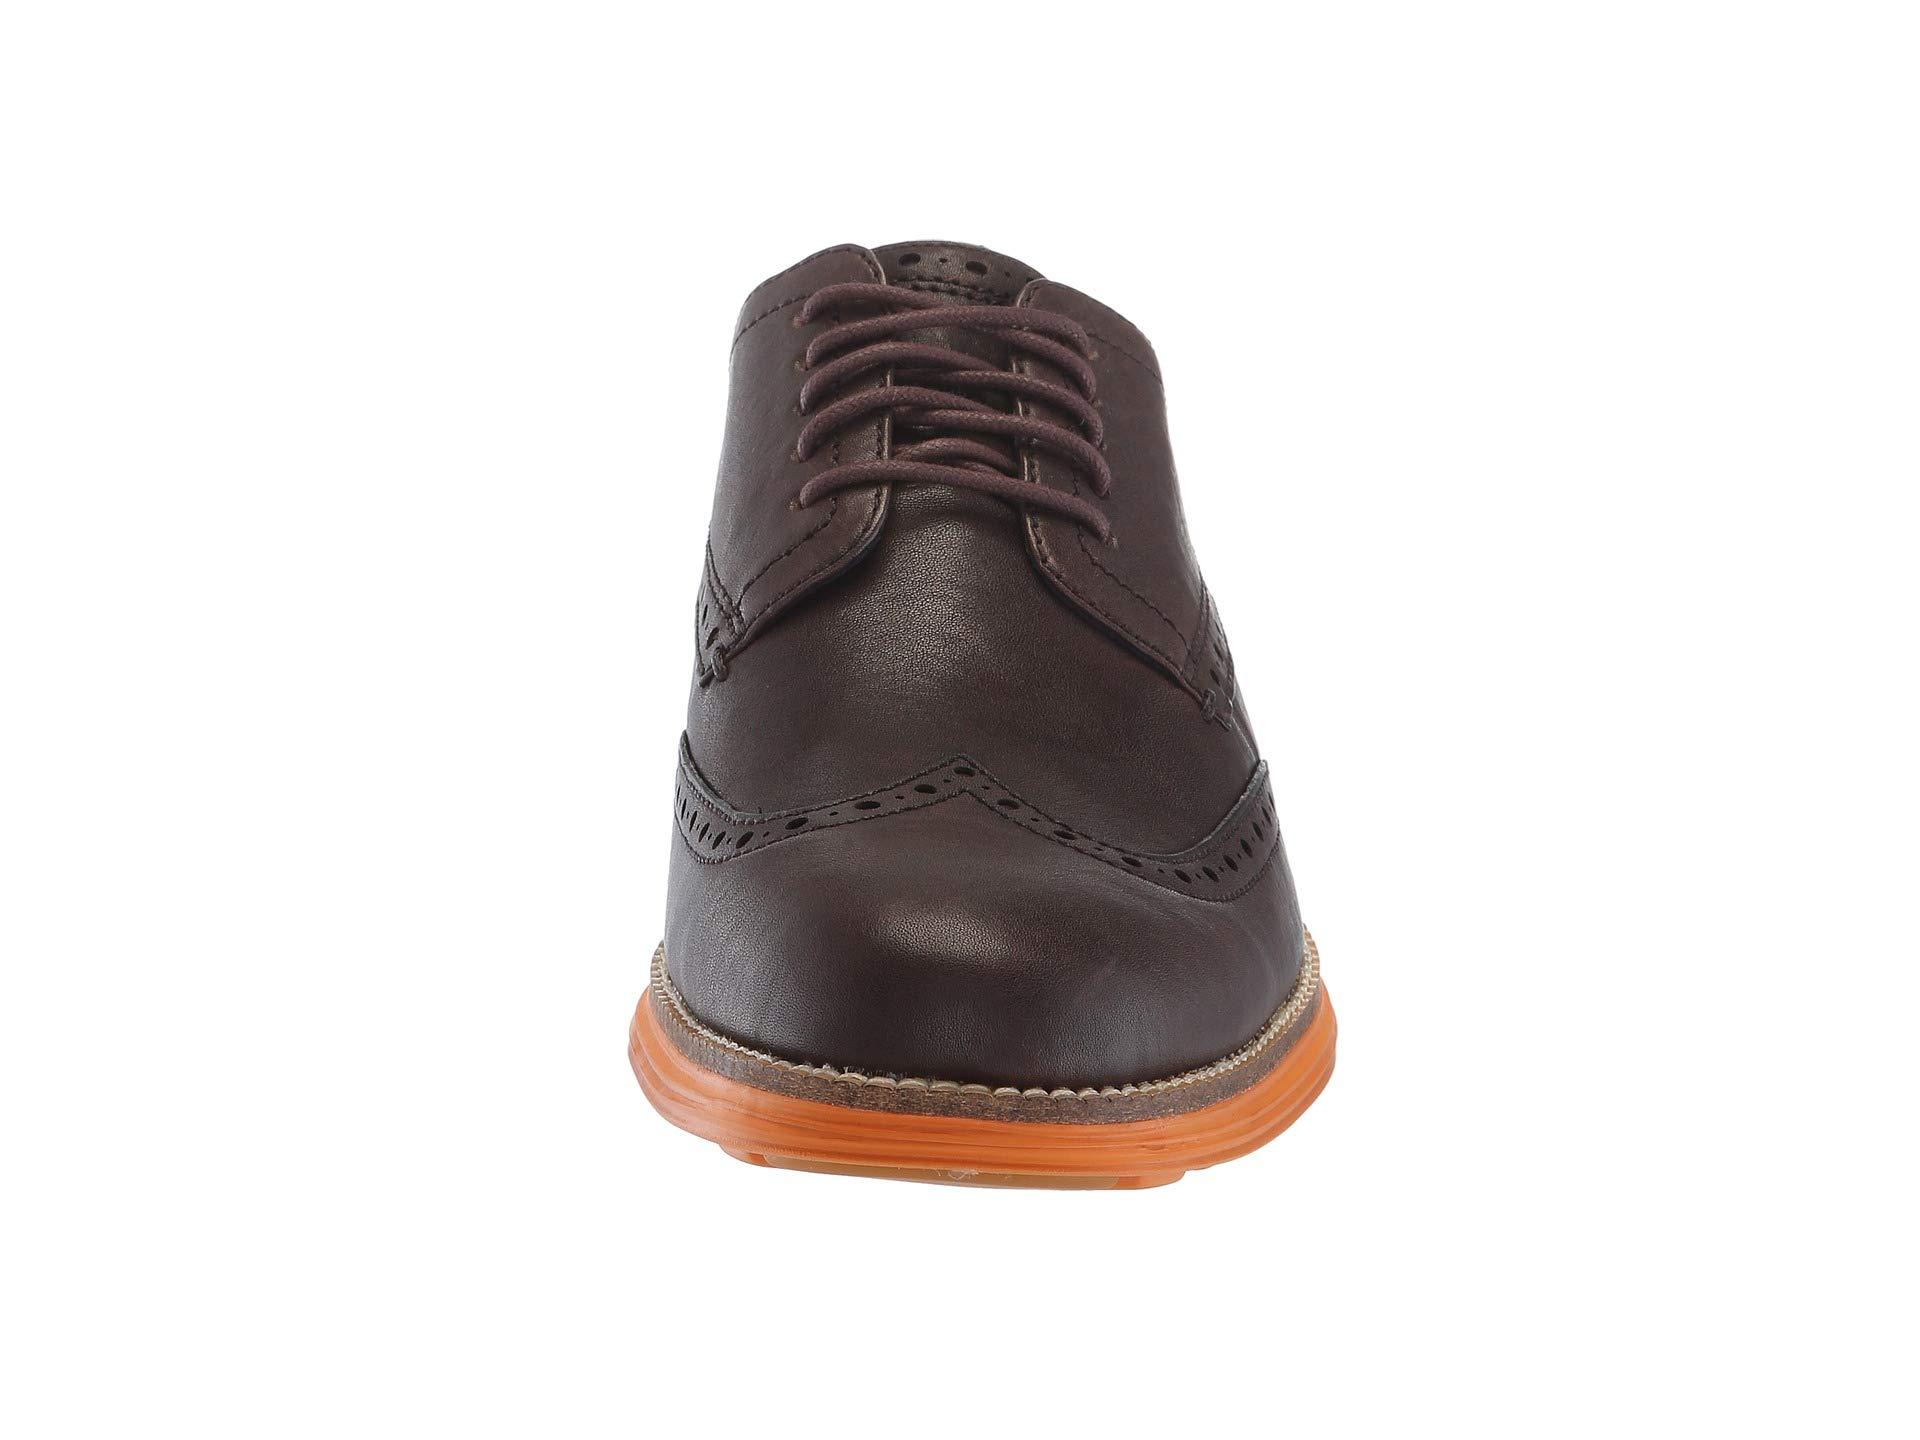 Grand Haan Java Oxford Wingtip Cole tumeric Leather Original fwqAFEO